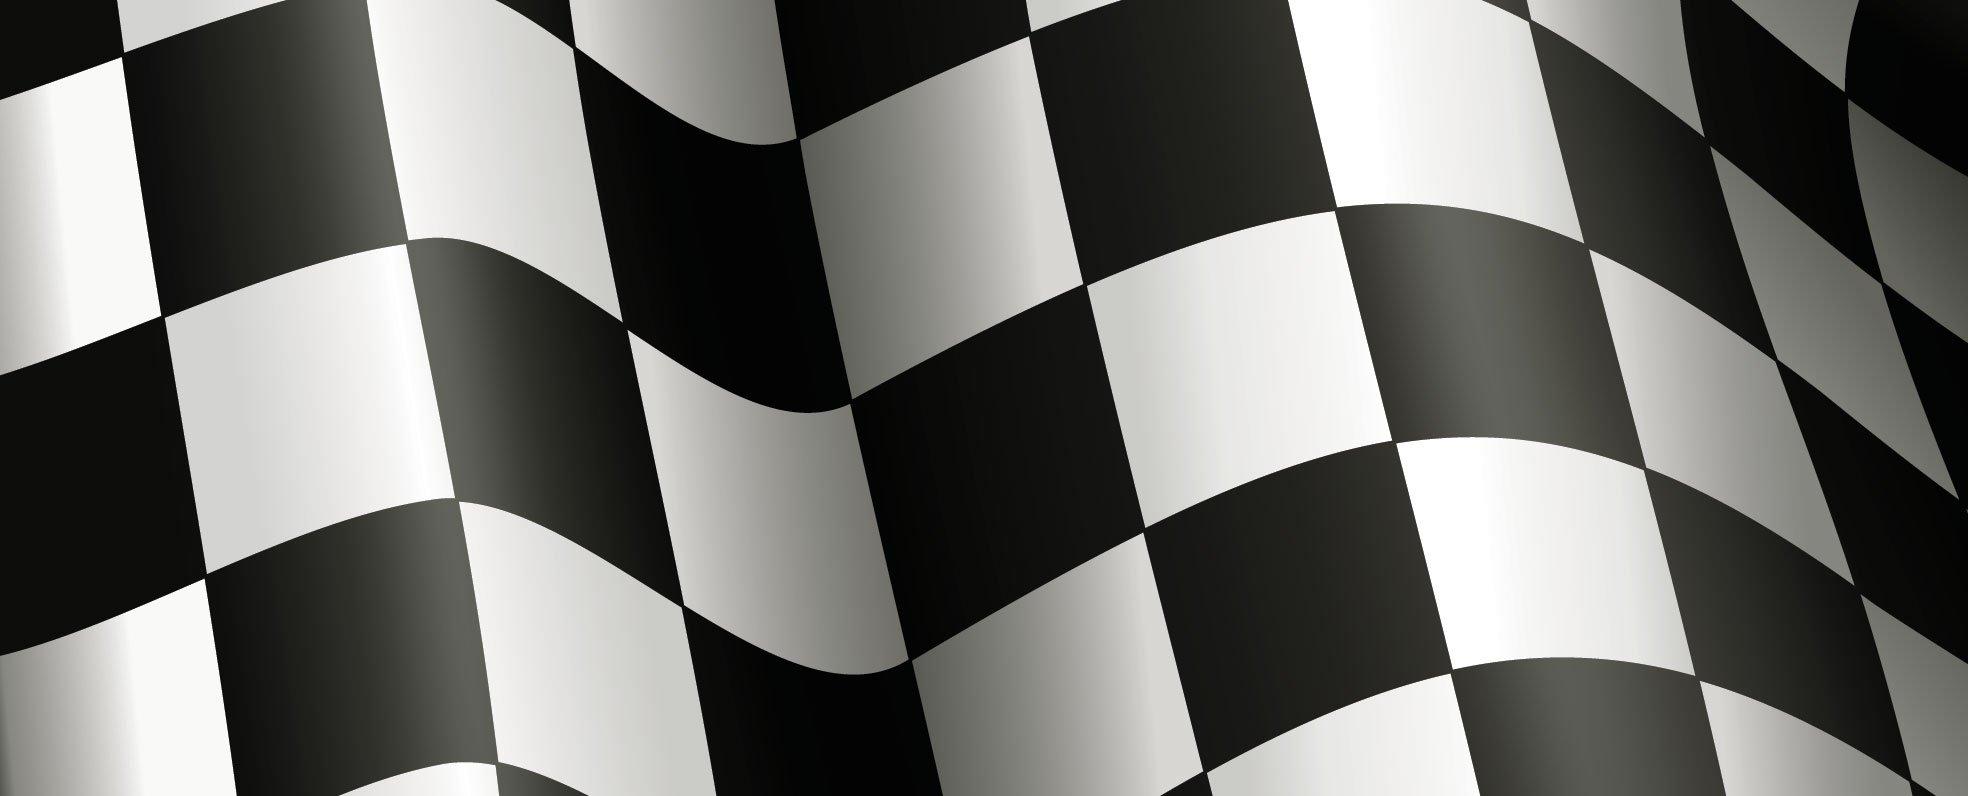 Checkered Flag Wallpaper - WallpaperSafari